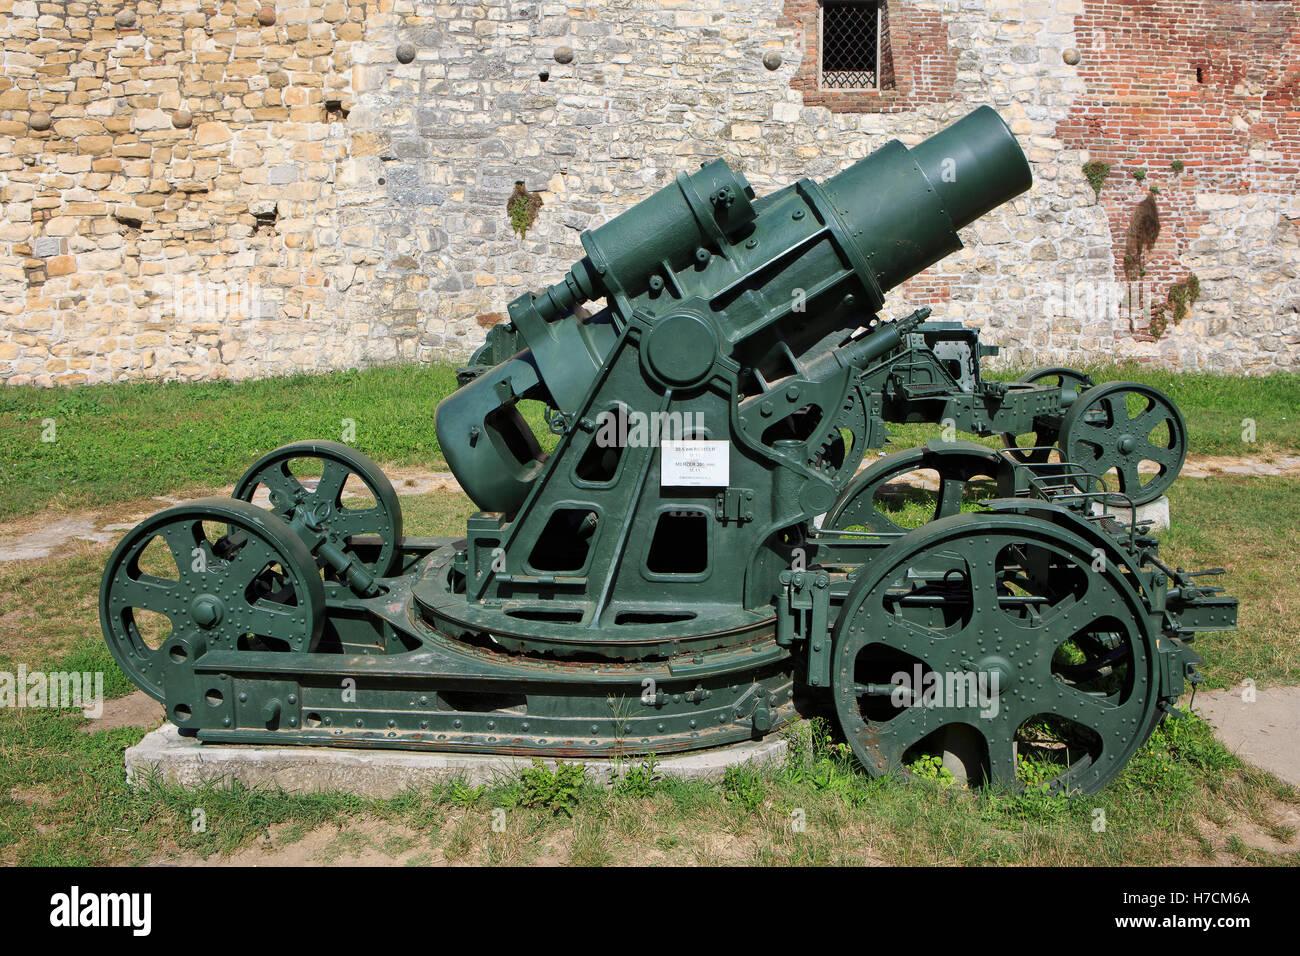 The Skoda 30.5 cm Mörser Model 1911 (M.11) siege howitzer at the Military Museum in Belgrade, Serbia - Stock Image